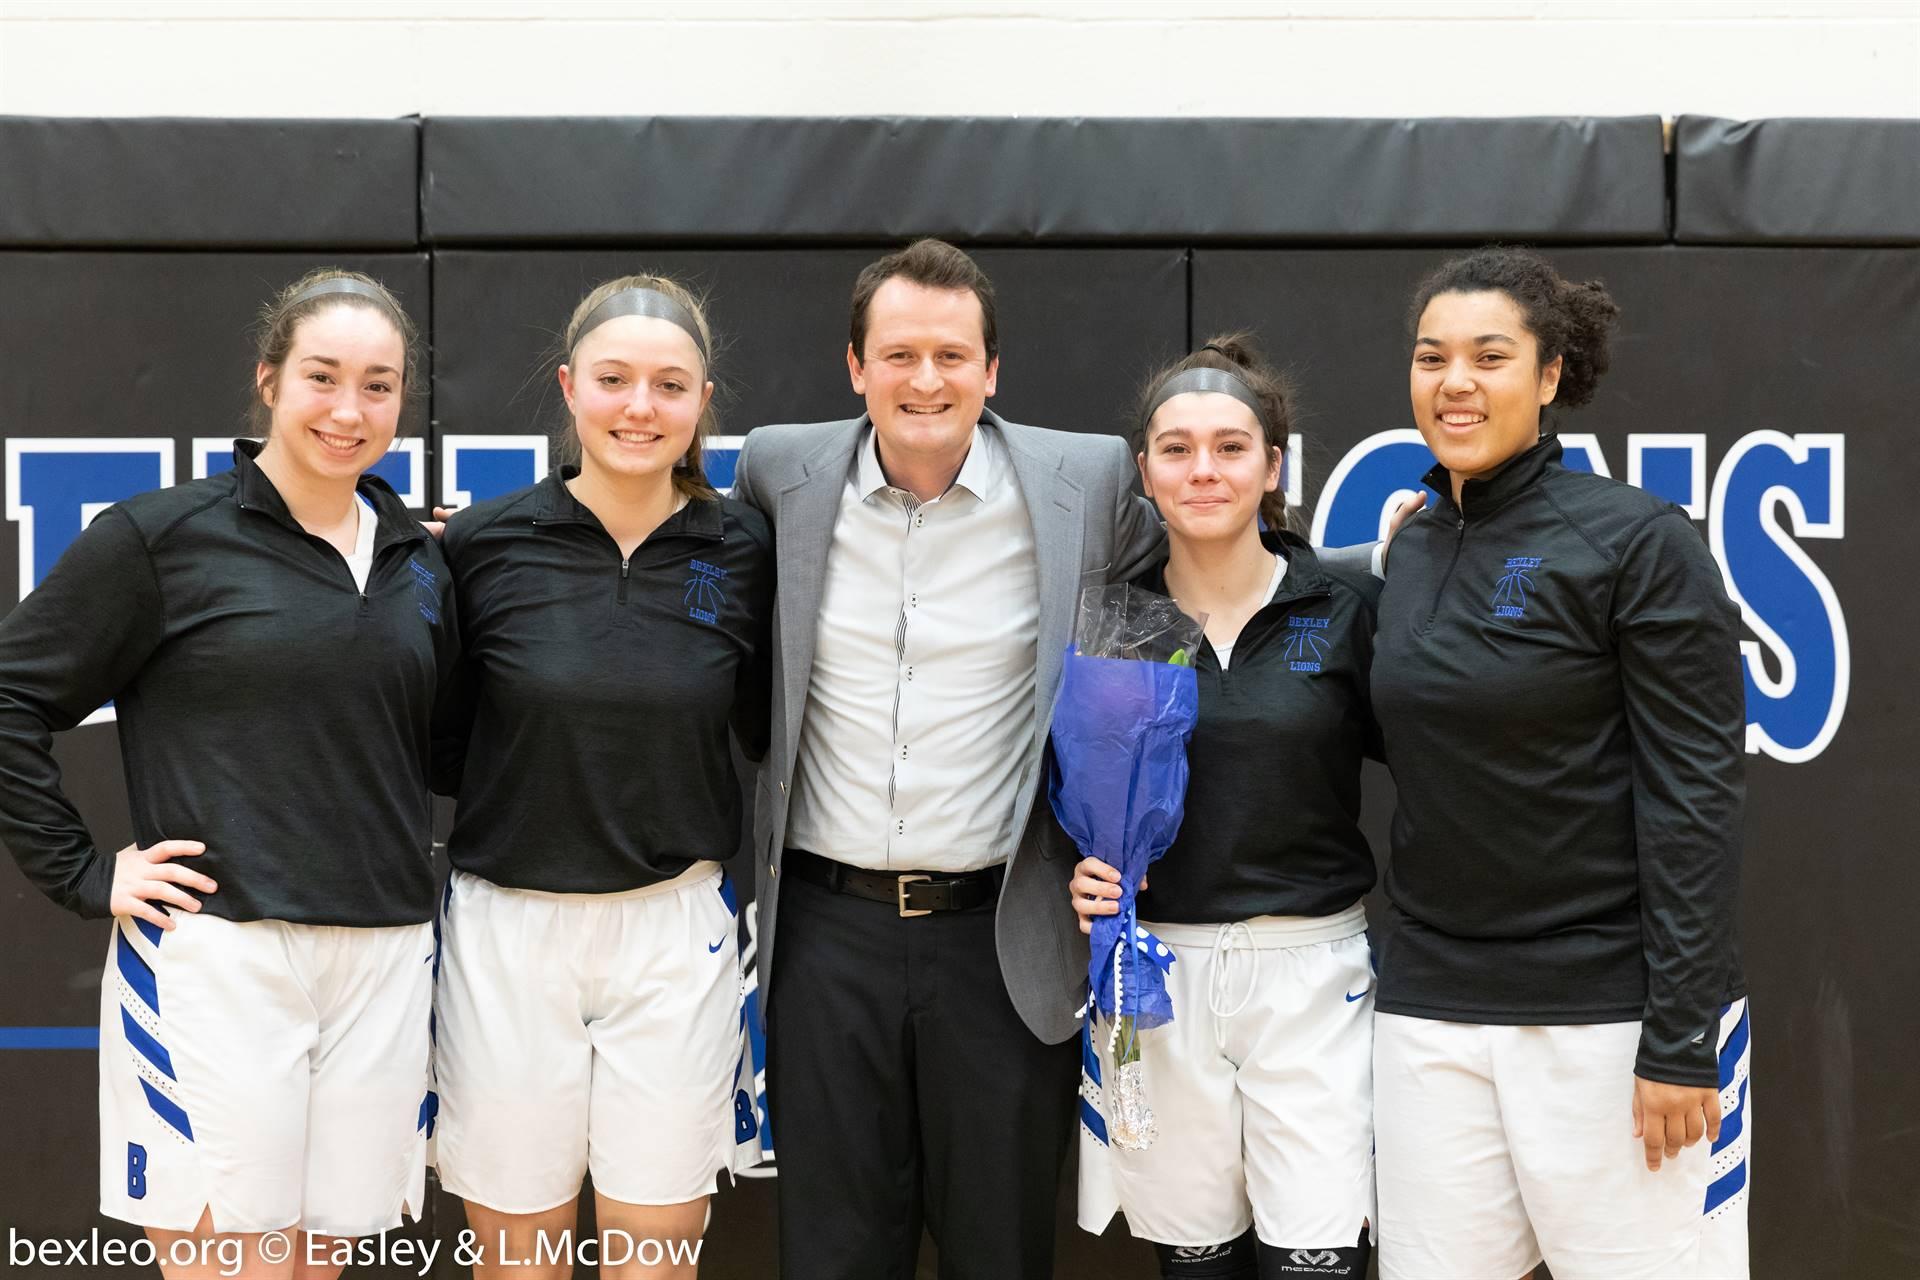 Bexley High School Senior Girls Basketball Players & coach pose for a photo